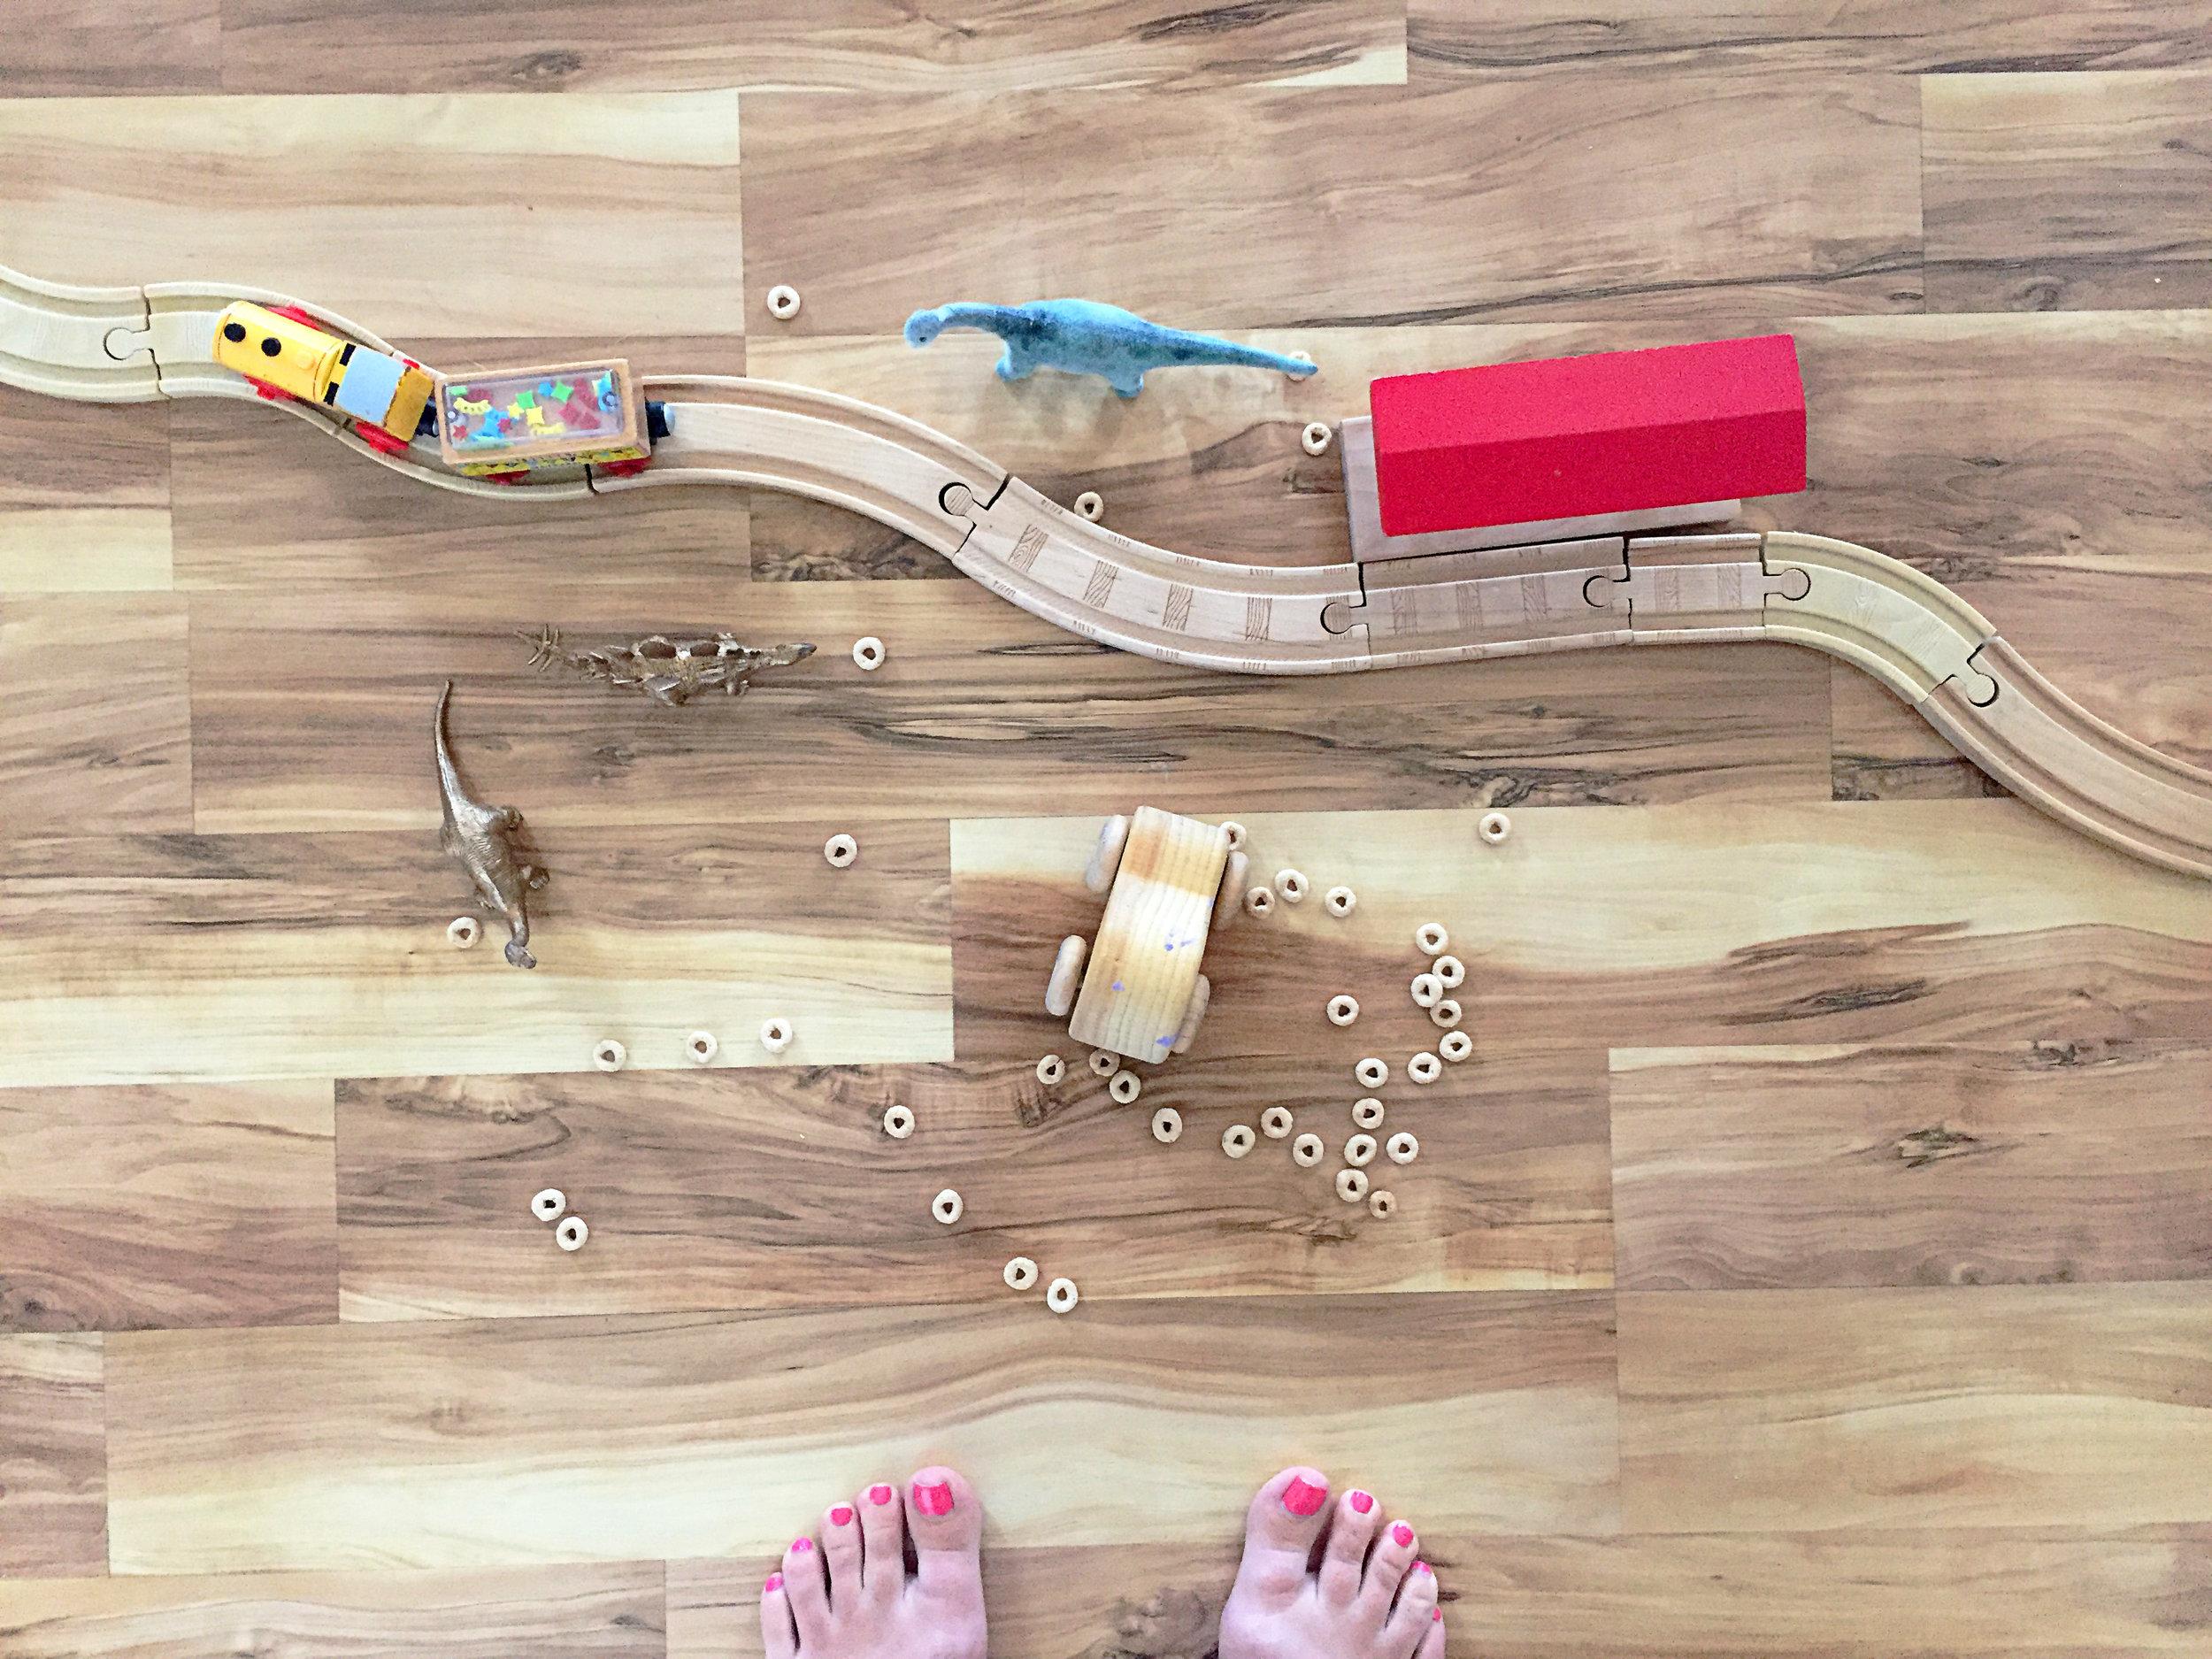 2018 07 19 Train 02.jpg